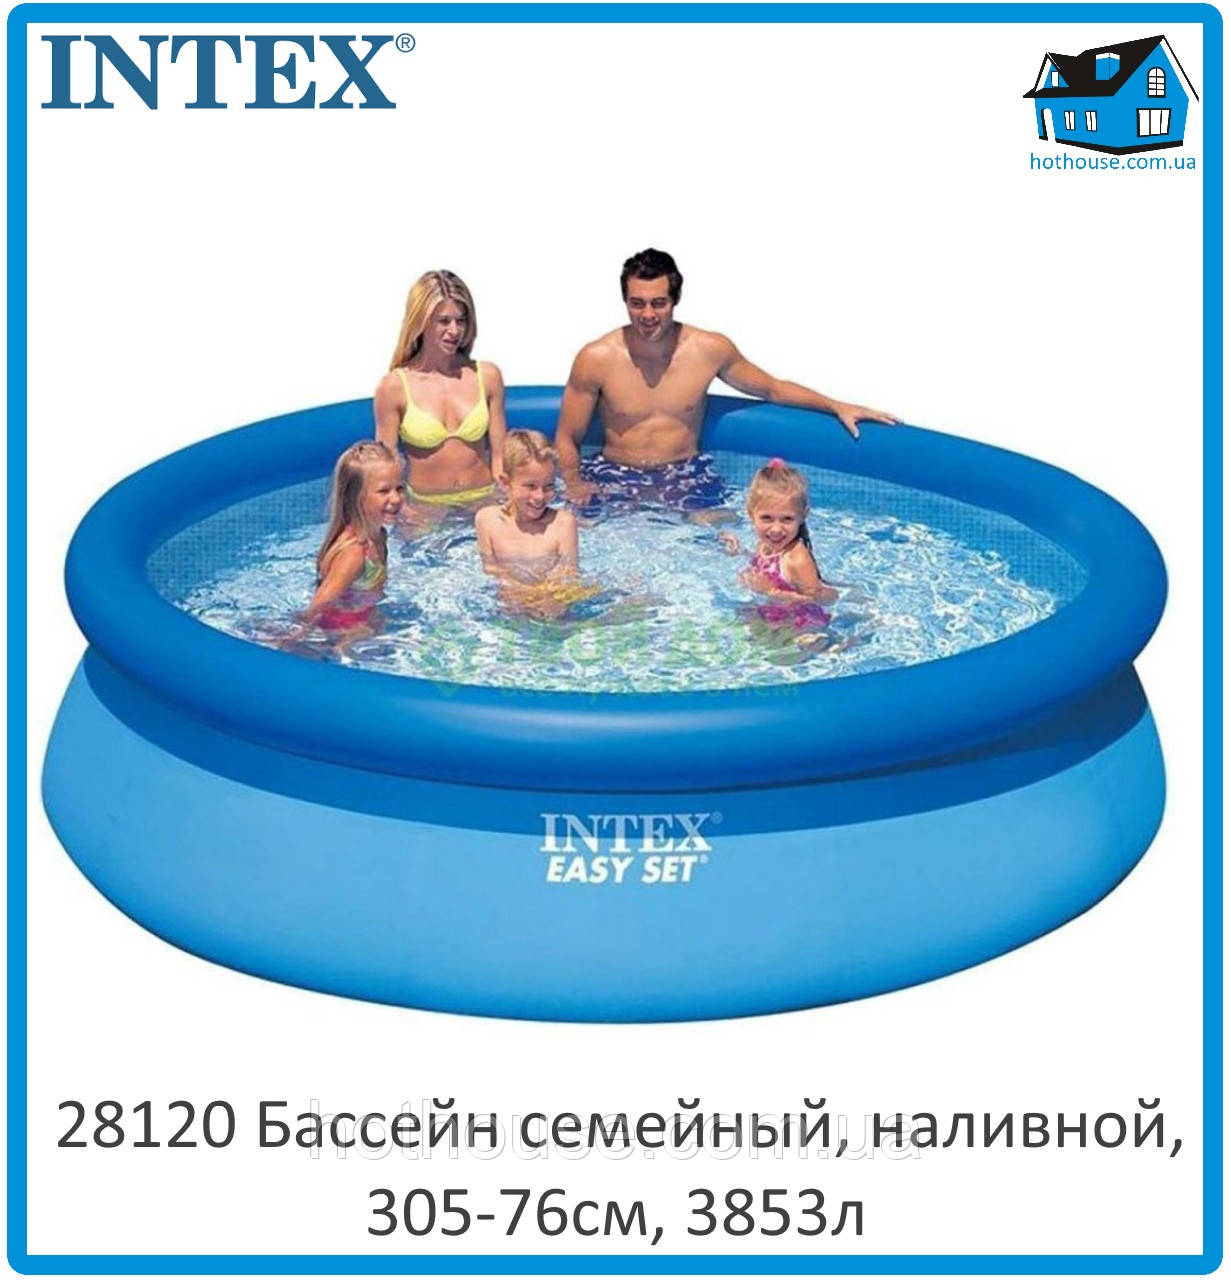 Наливной семейный басейн INTEX 28120